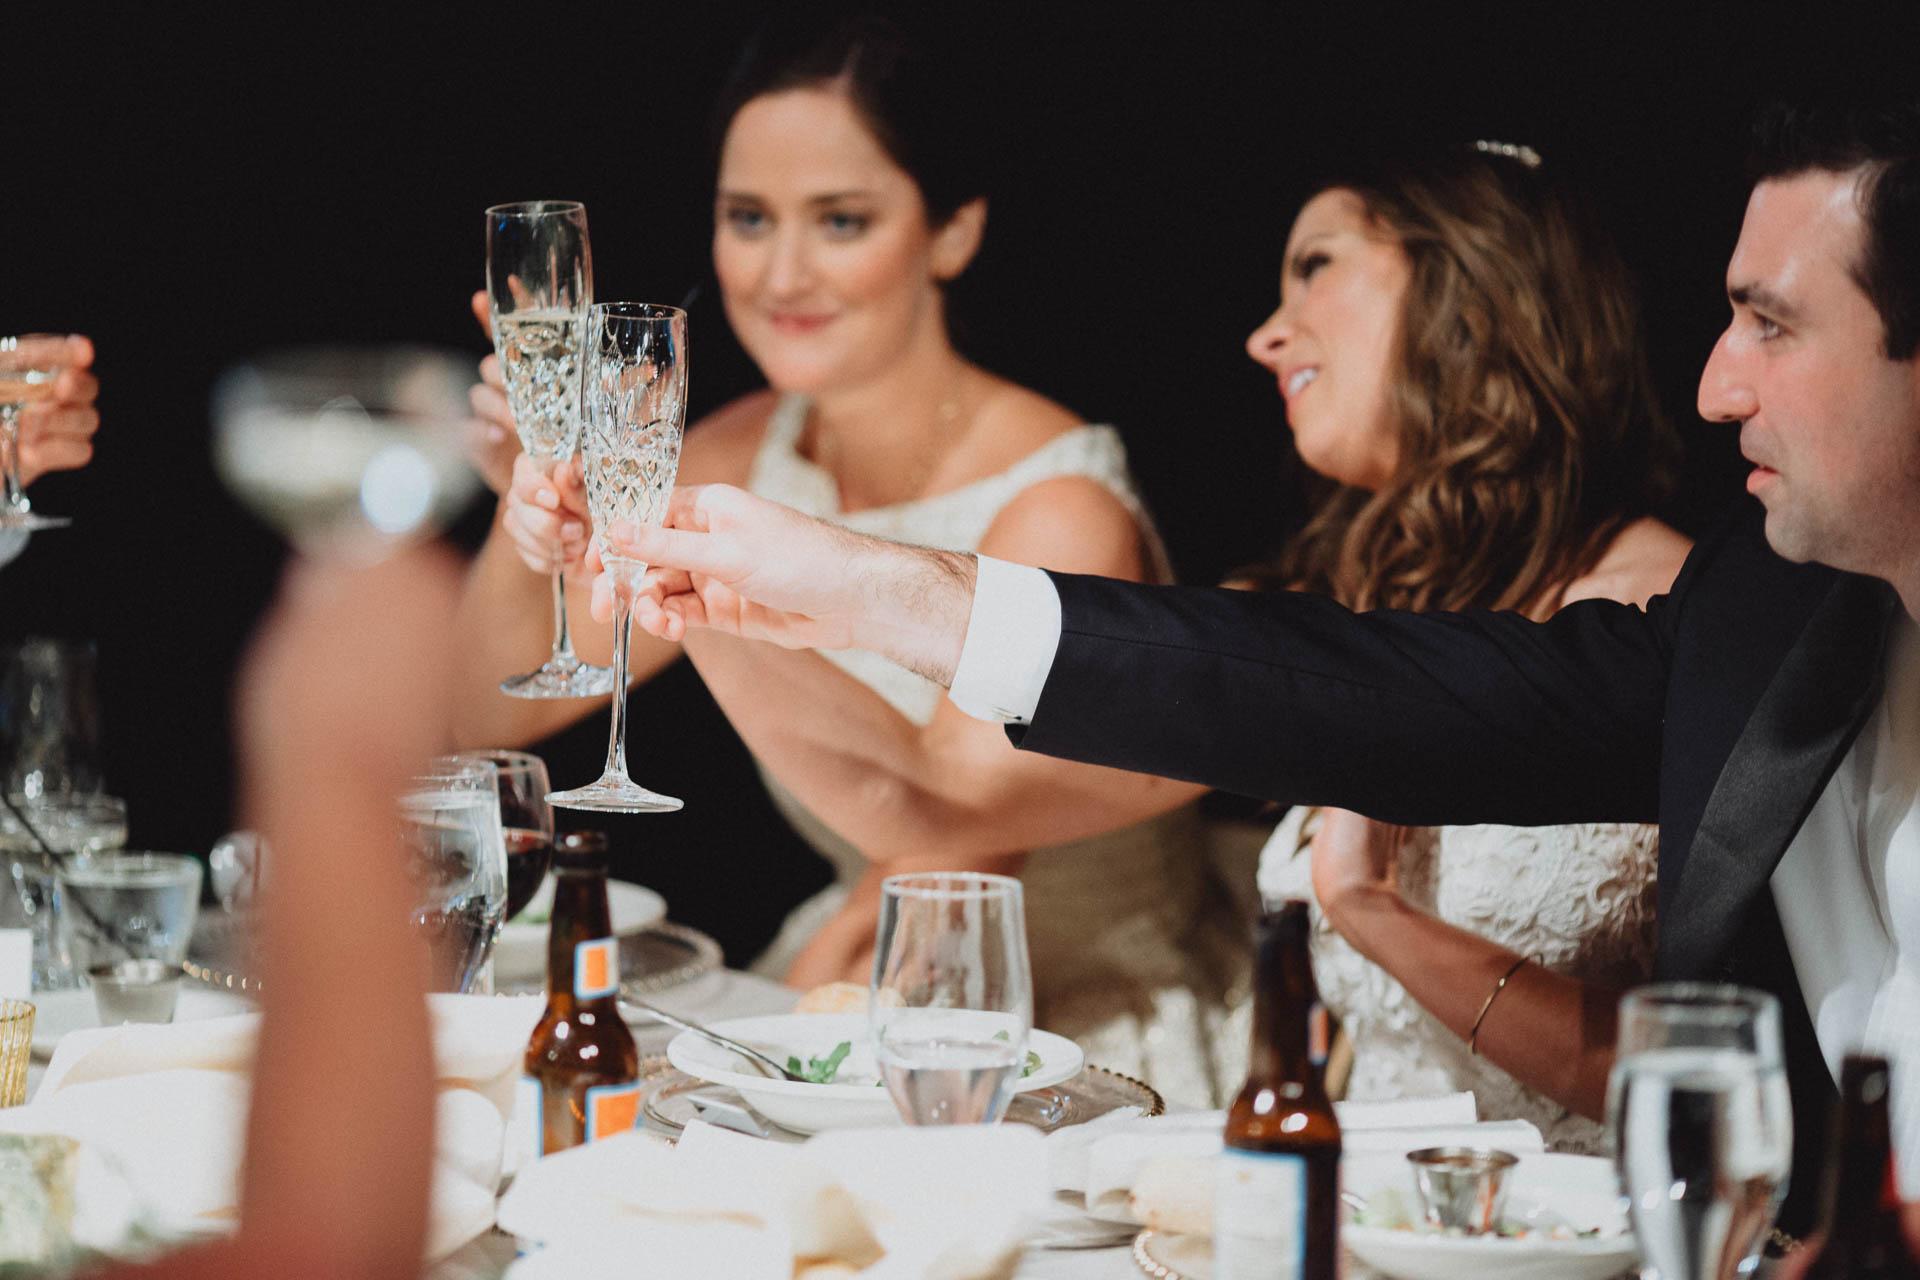 Keri-Joseph-Top-of-the-Market-Wedding-183@2x.jpg